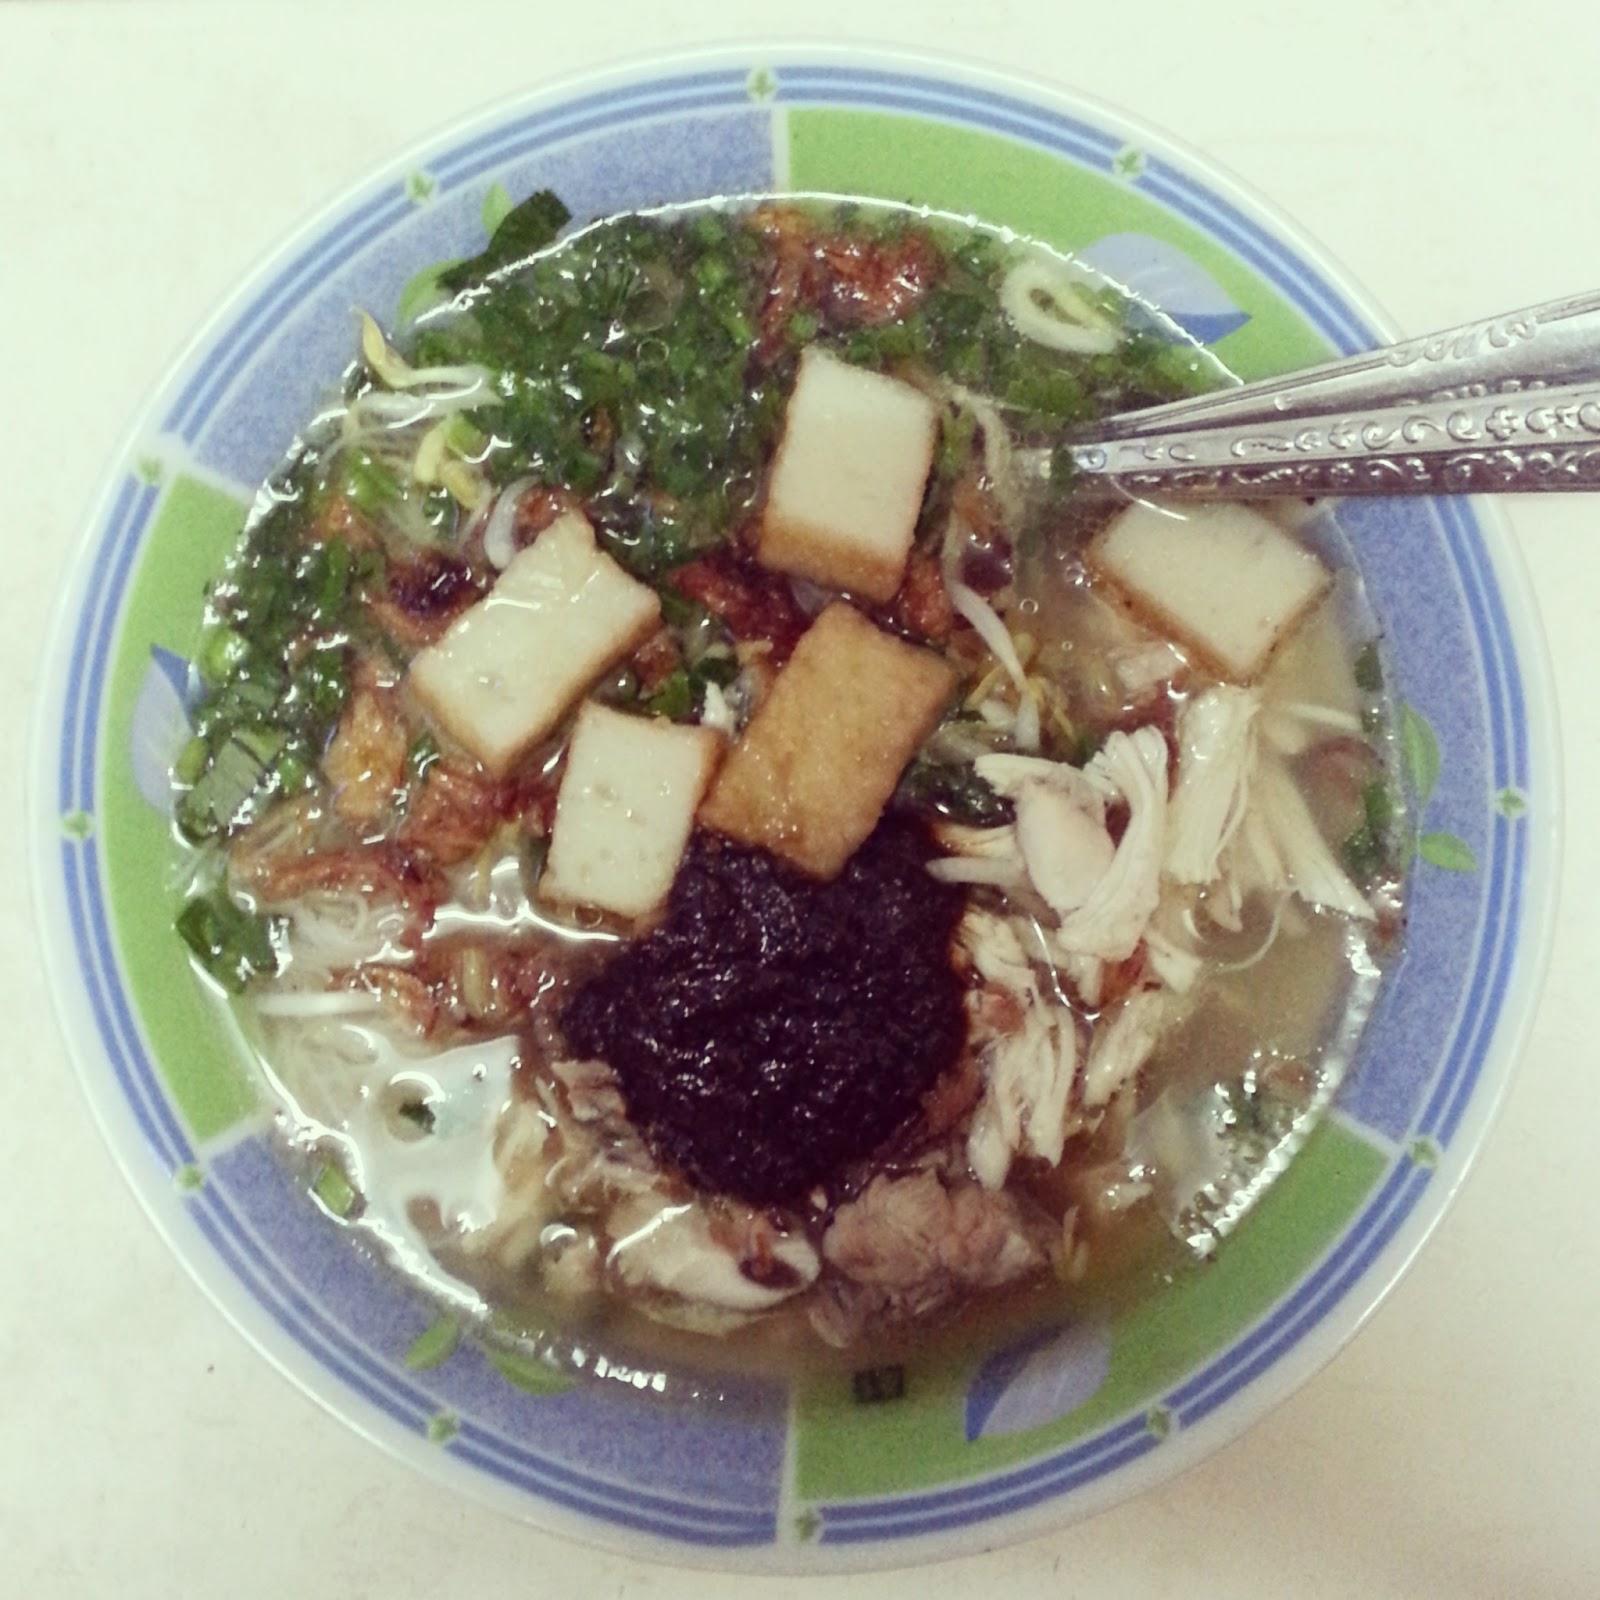 resepi bihun  ayam resepi bihun  kedah sedap  lazat  menyelerakan  ayam Resepi Nasi Jagung Enak dan Mudah